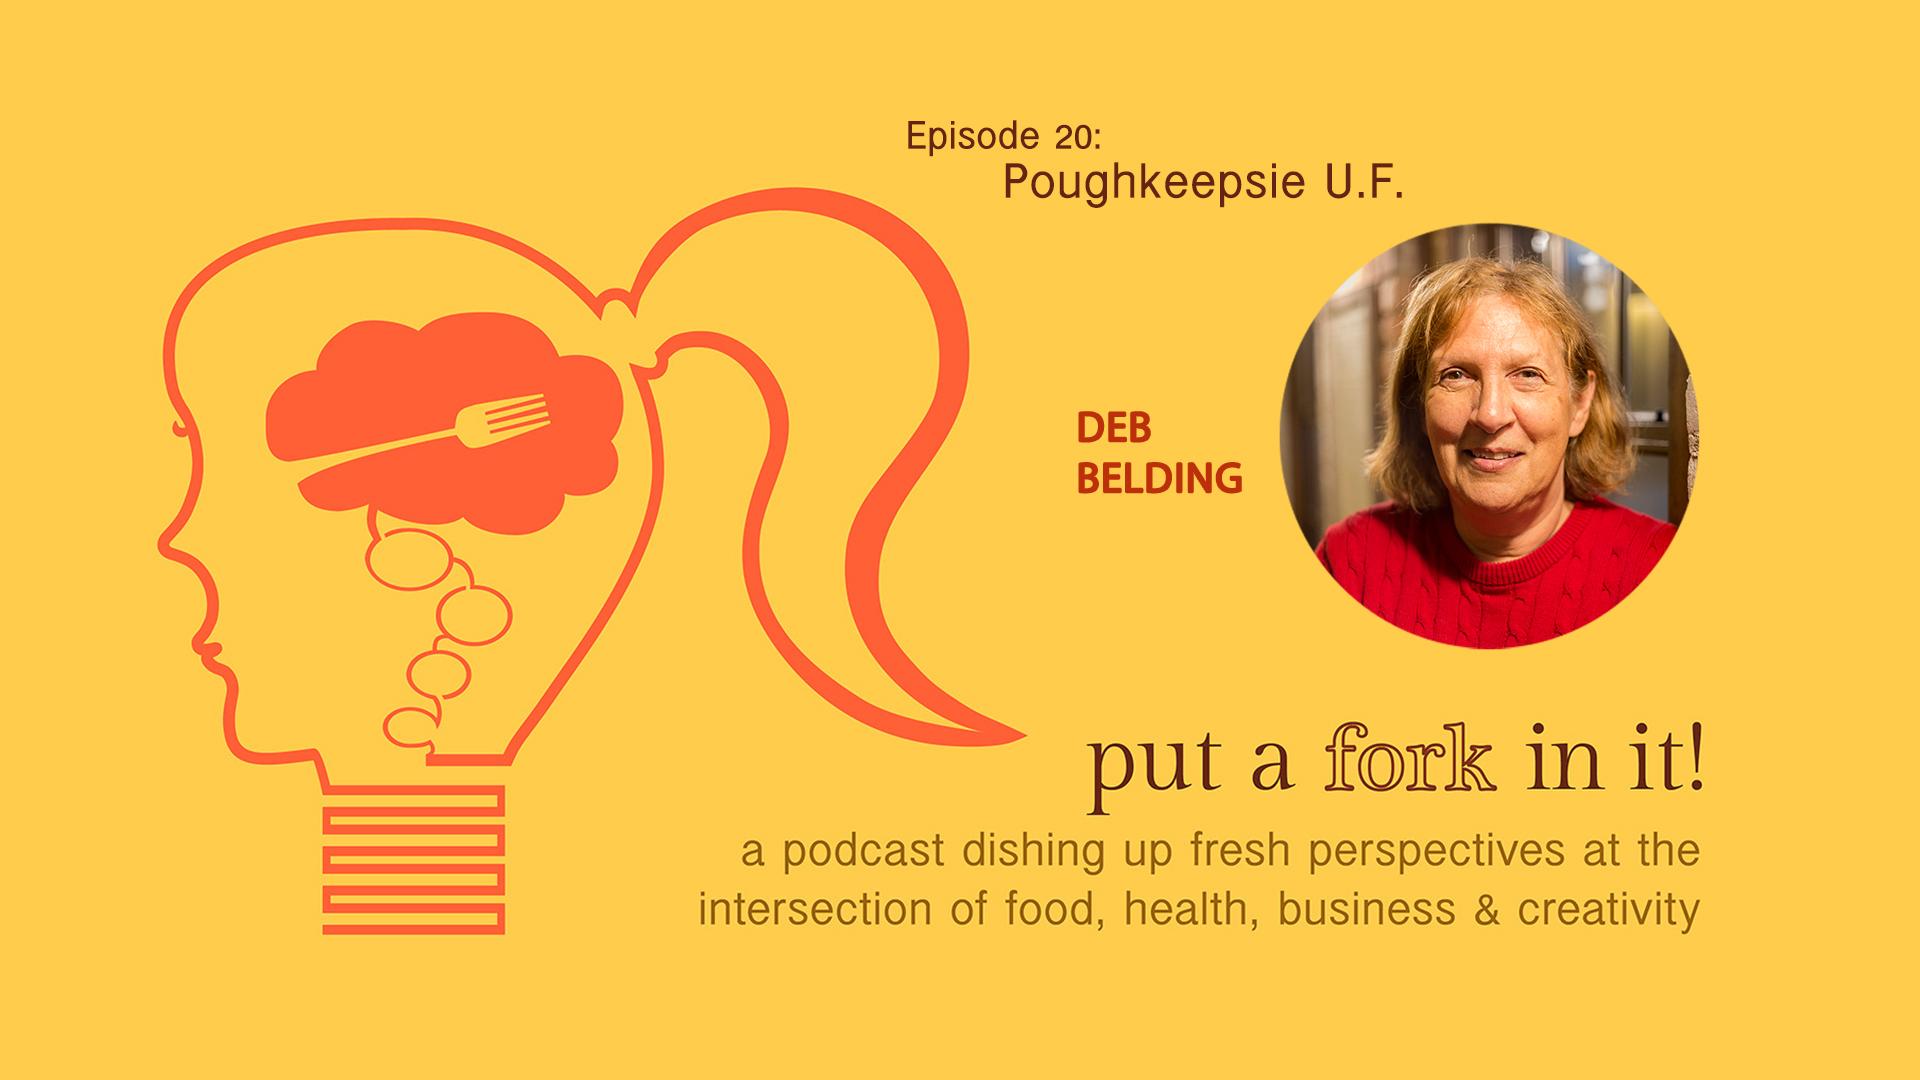 PAFII Episode 20: Deb Belding, Program Coordinator for Poughkeepsie Underwear Factory